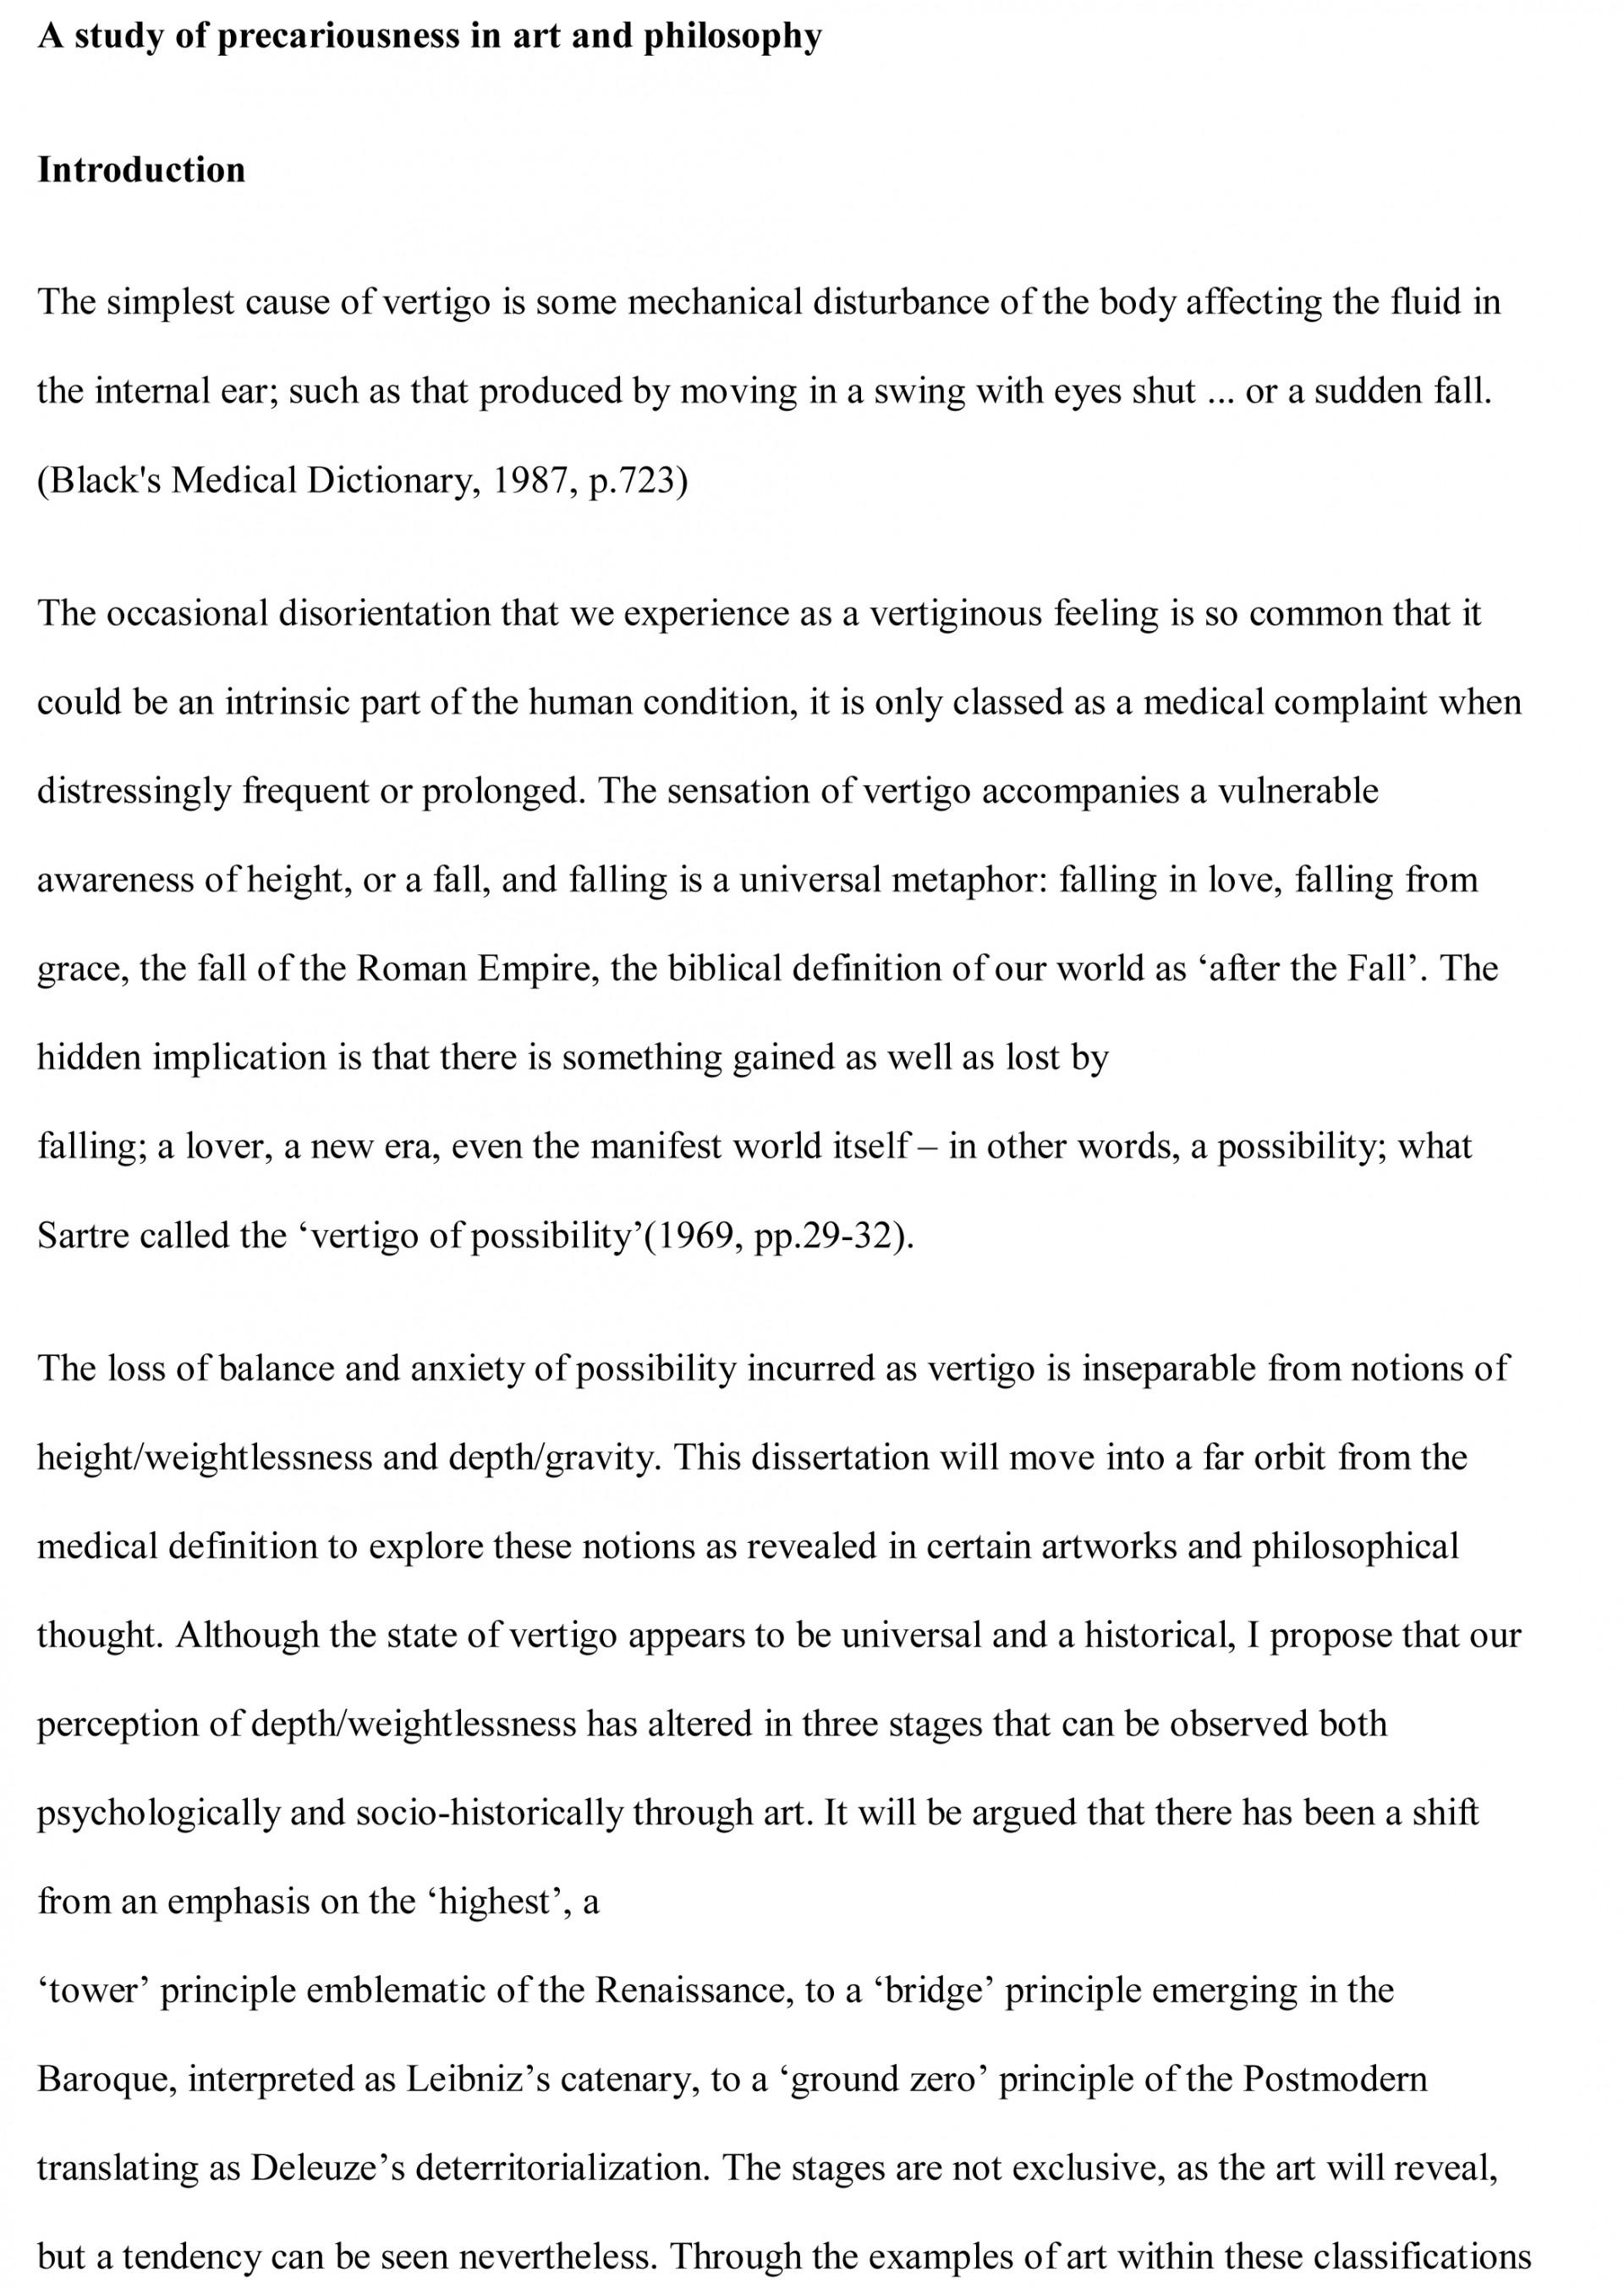 017 Essay Example Sample Act Essays Art Coursework Wonderful New 1920